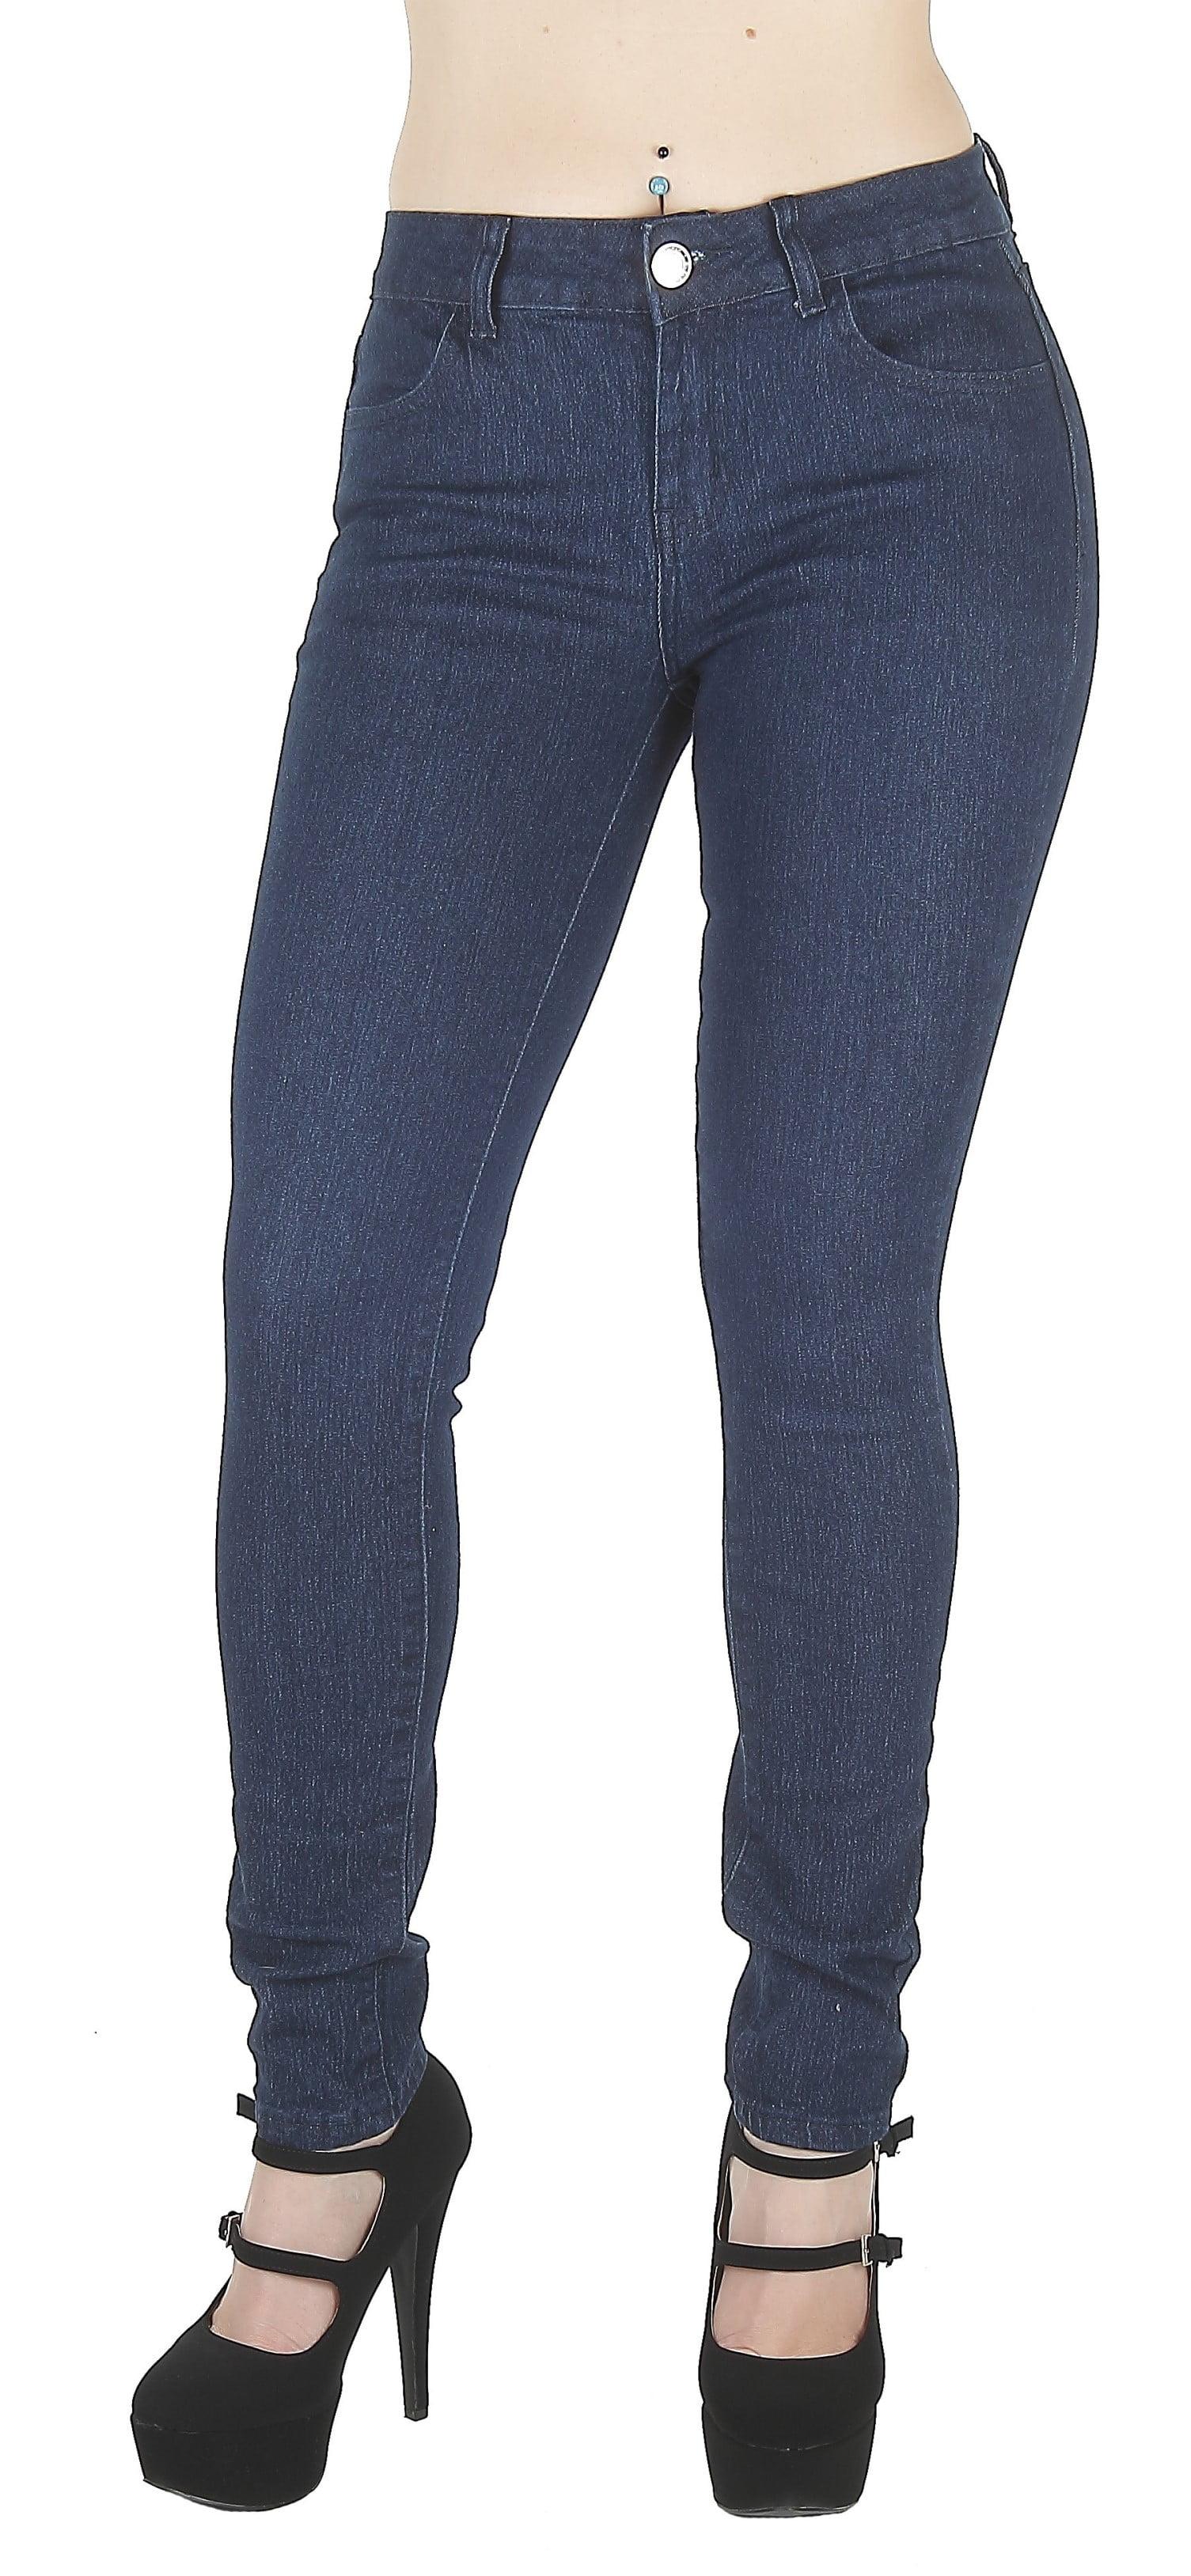 F2L-N520A-P - Plus Size, Classic 4 Pockets, Mid Waist, Sexy Skinny Jeans